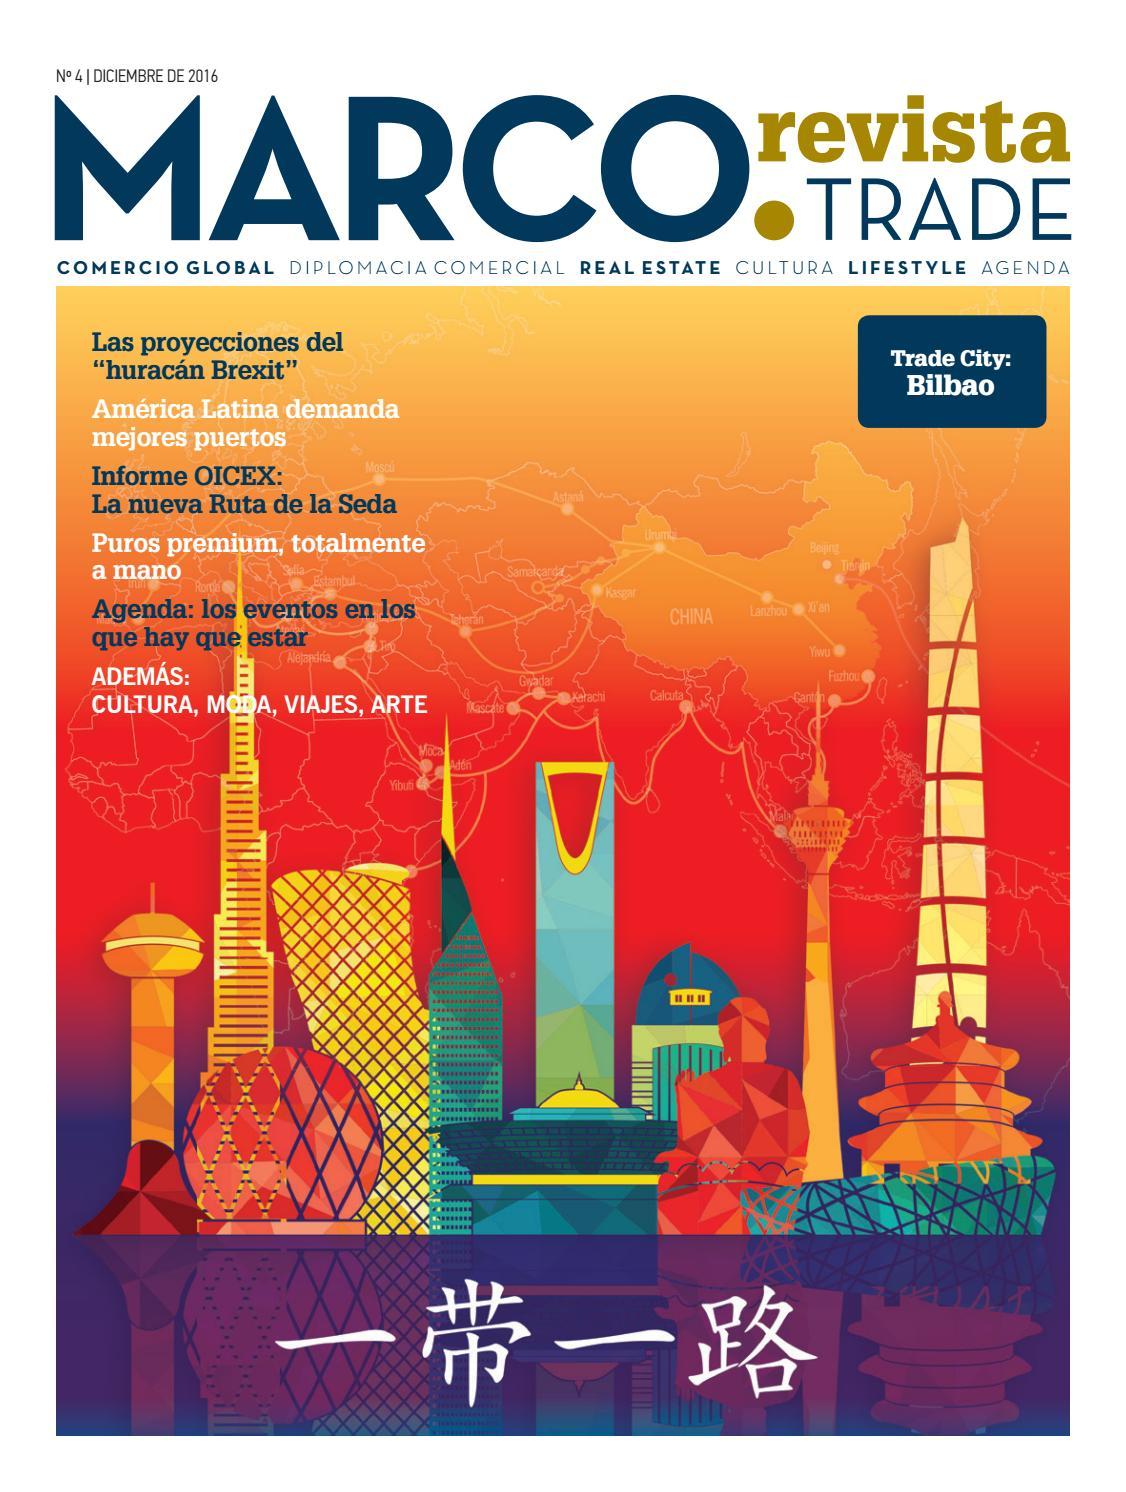 Marco trade revista numero 3 by marco trade revista issuu marco trade revista numero 4 malvernweather Choice Image